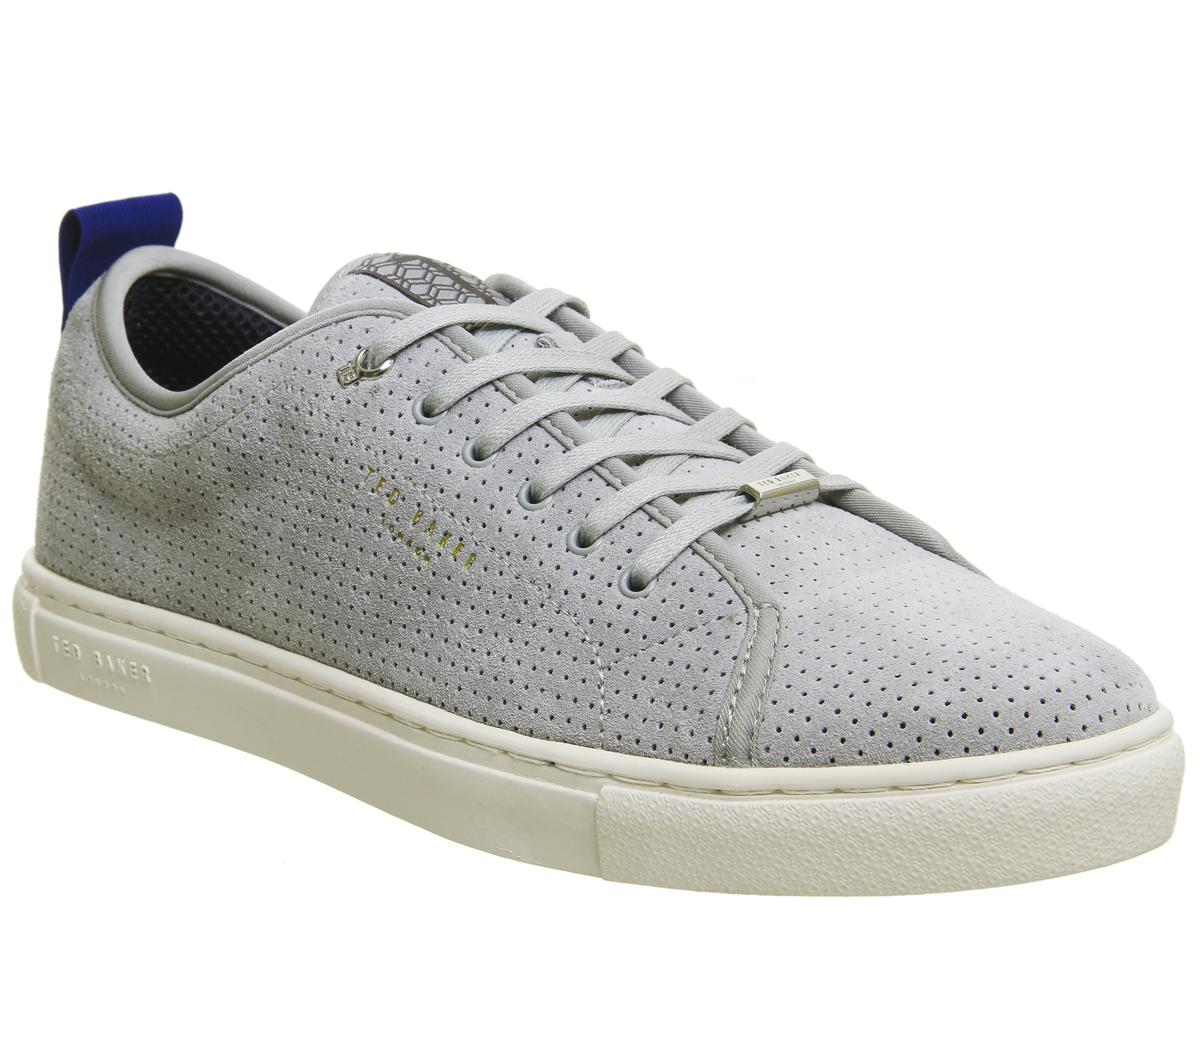 Ted Baker Kaliix Sneakers Grey Suede